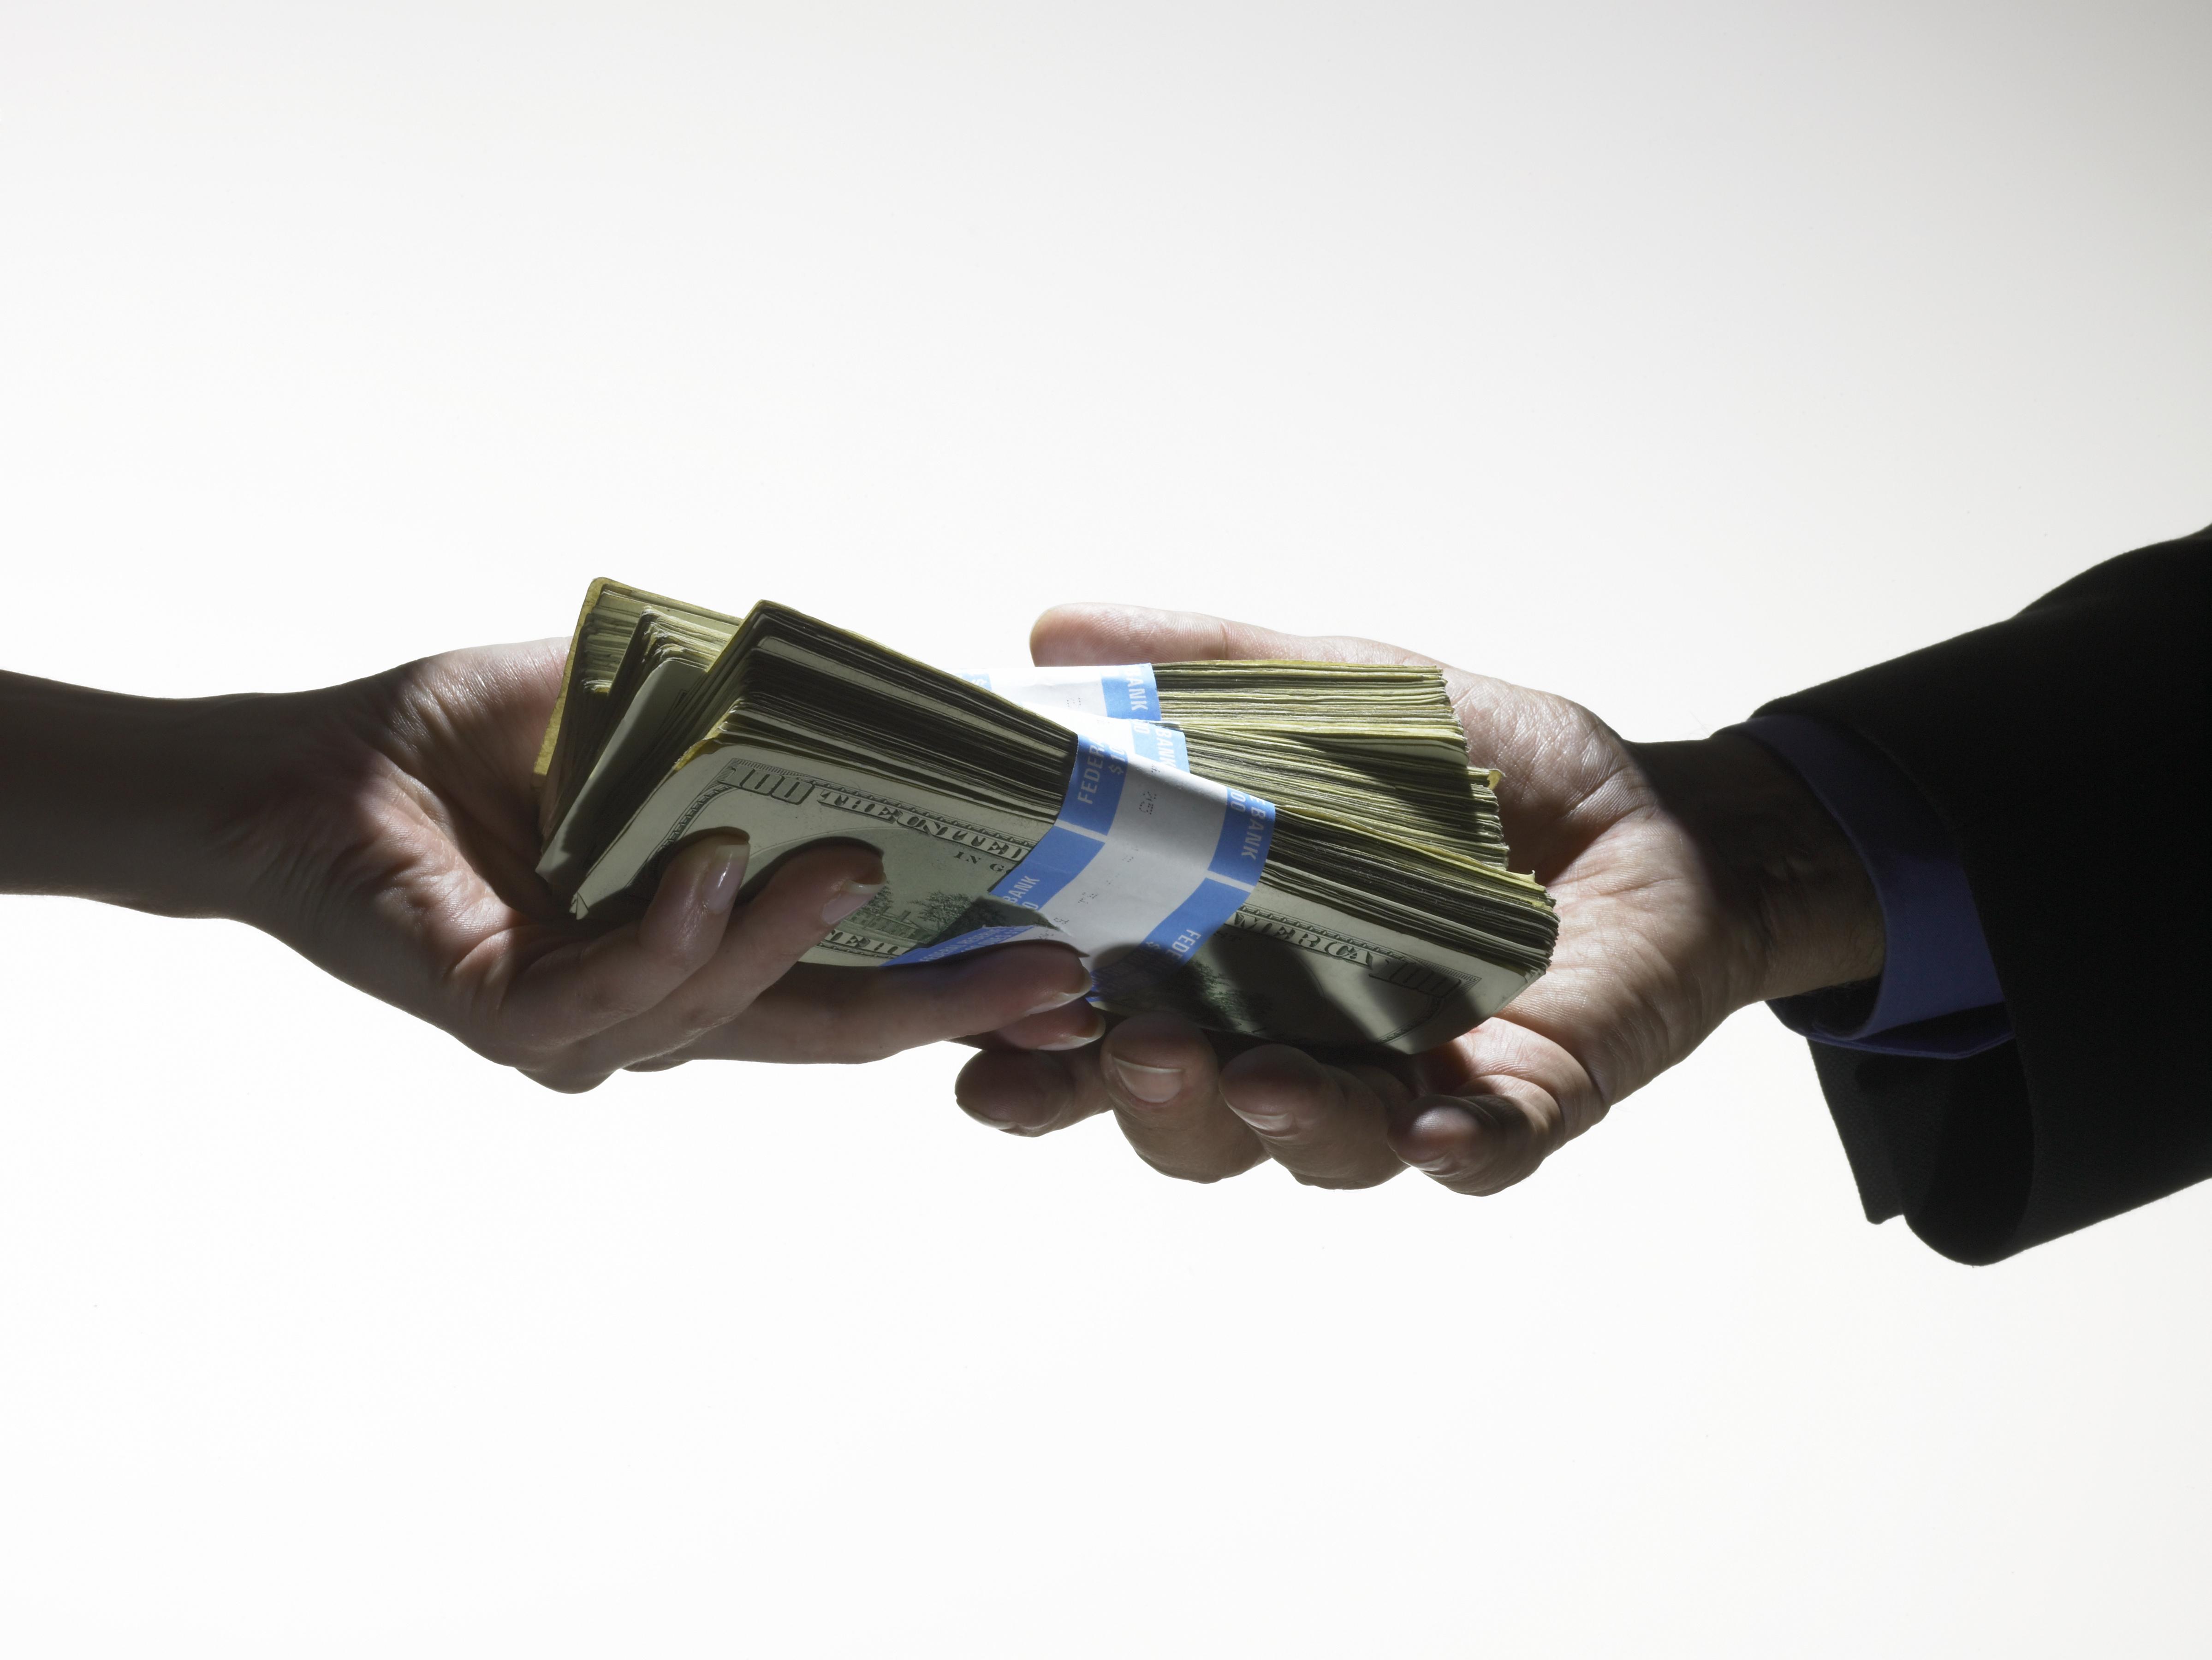 money exchanging hands payment